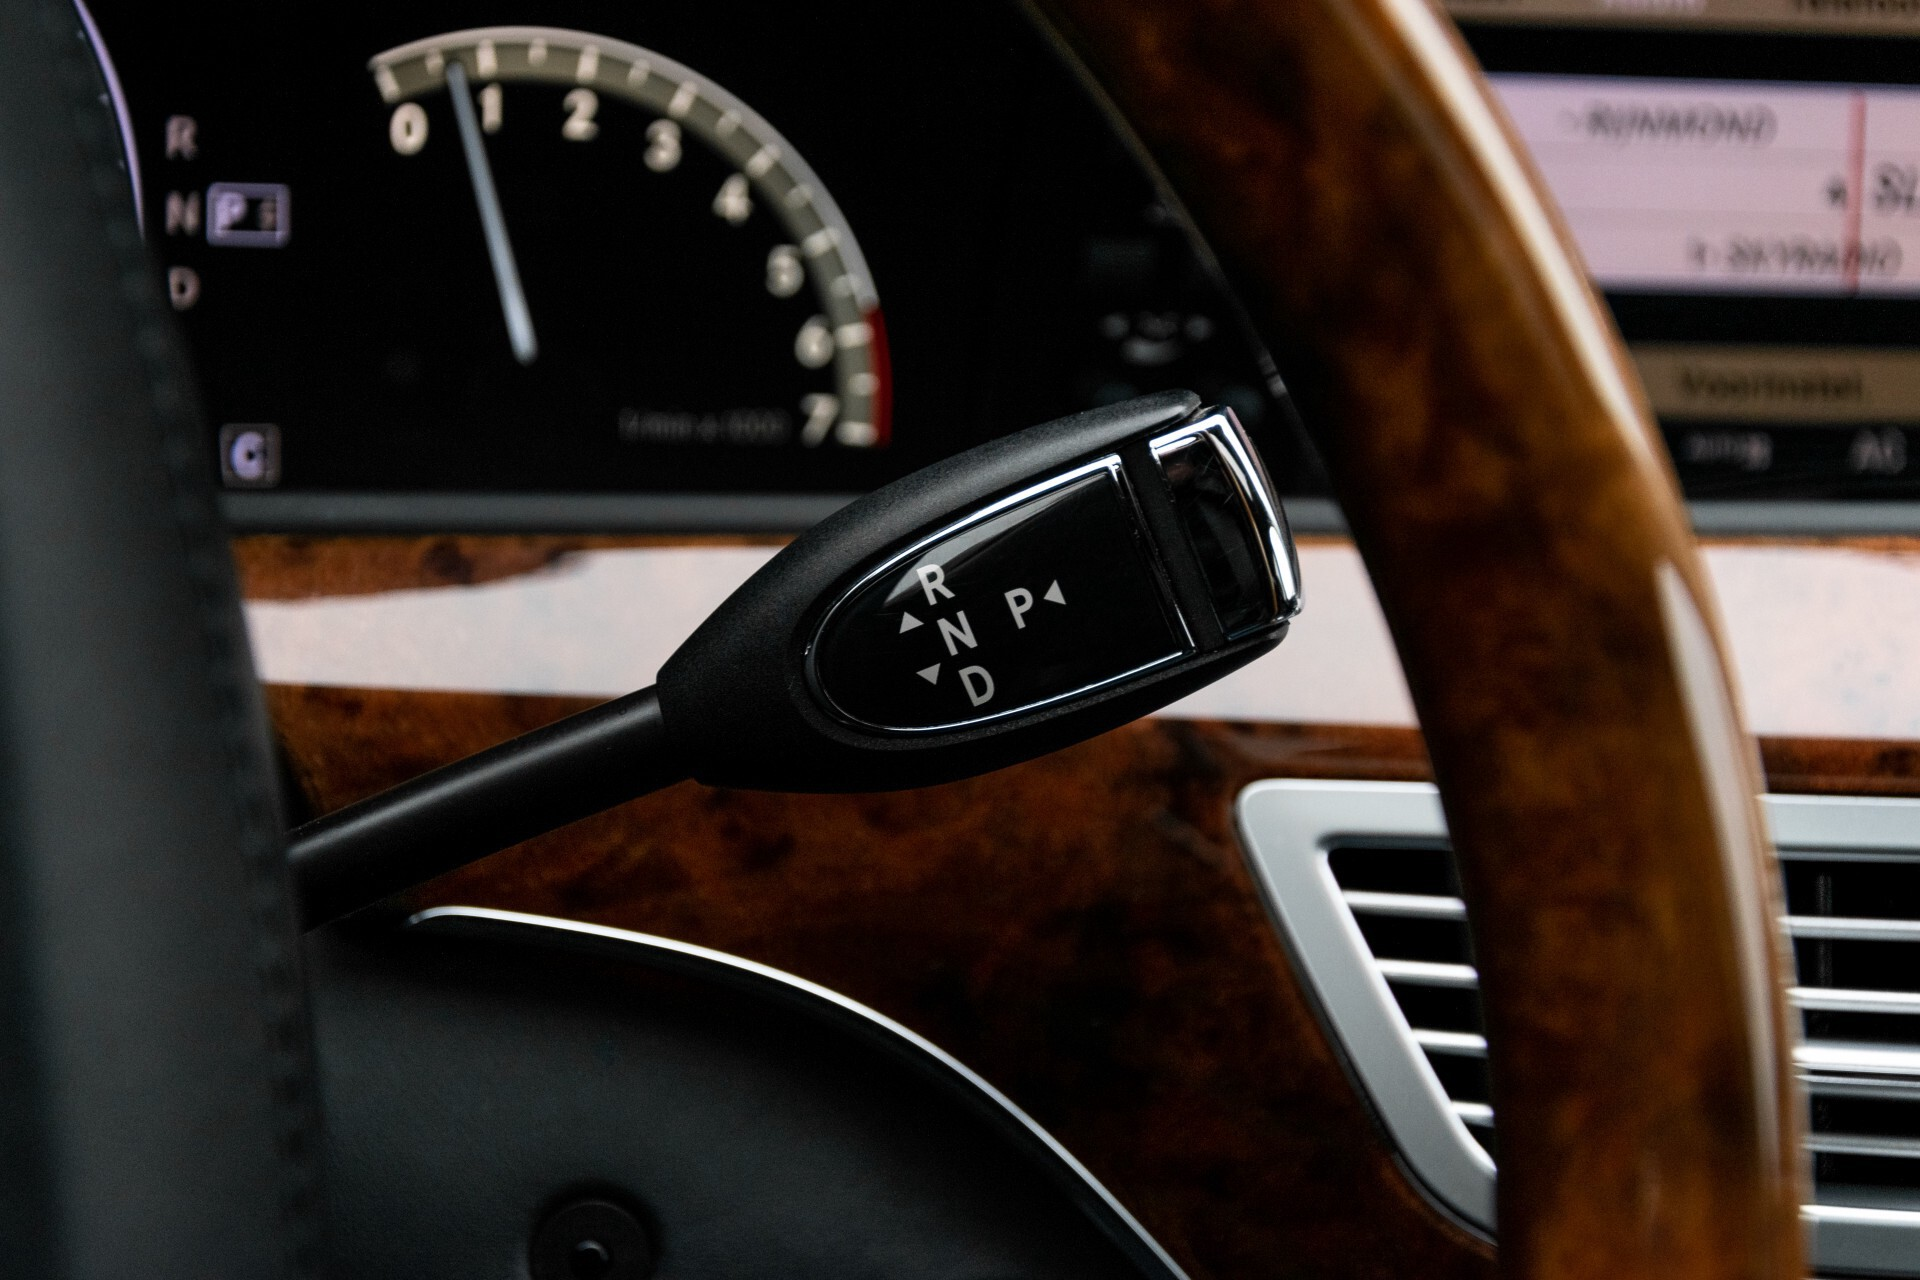 Mercedes-Benz S-Klasse 600 Lang 65 AMG Bi-Turbo Prestige Plus Aut5 Foto 13